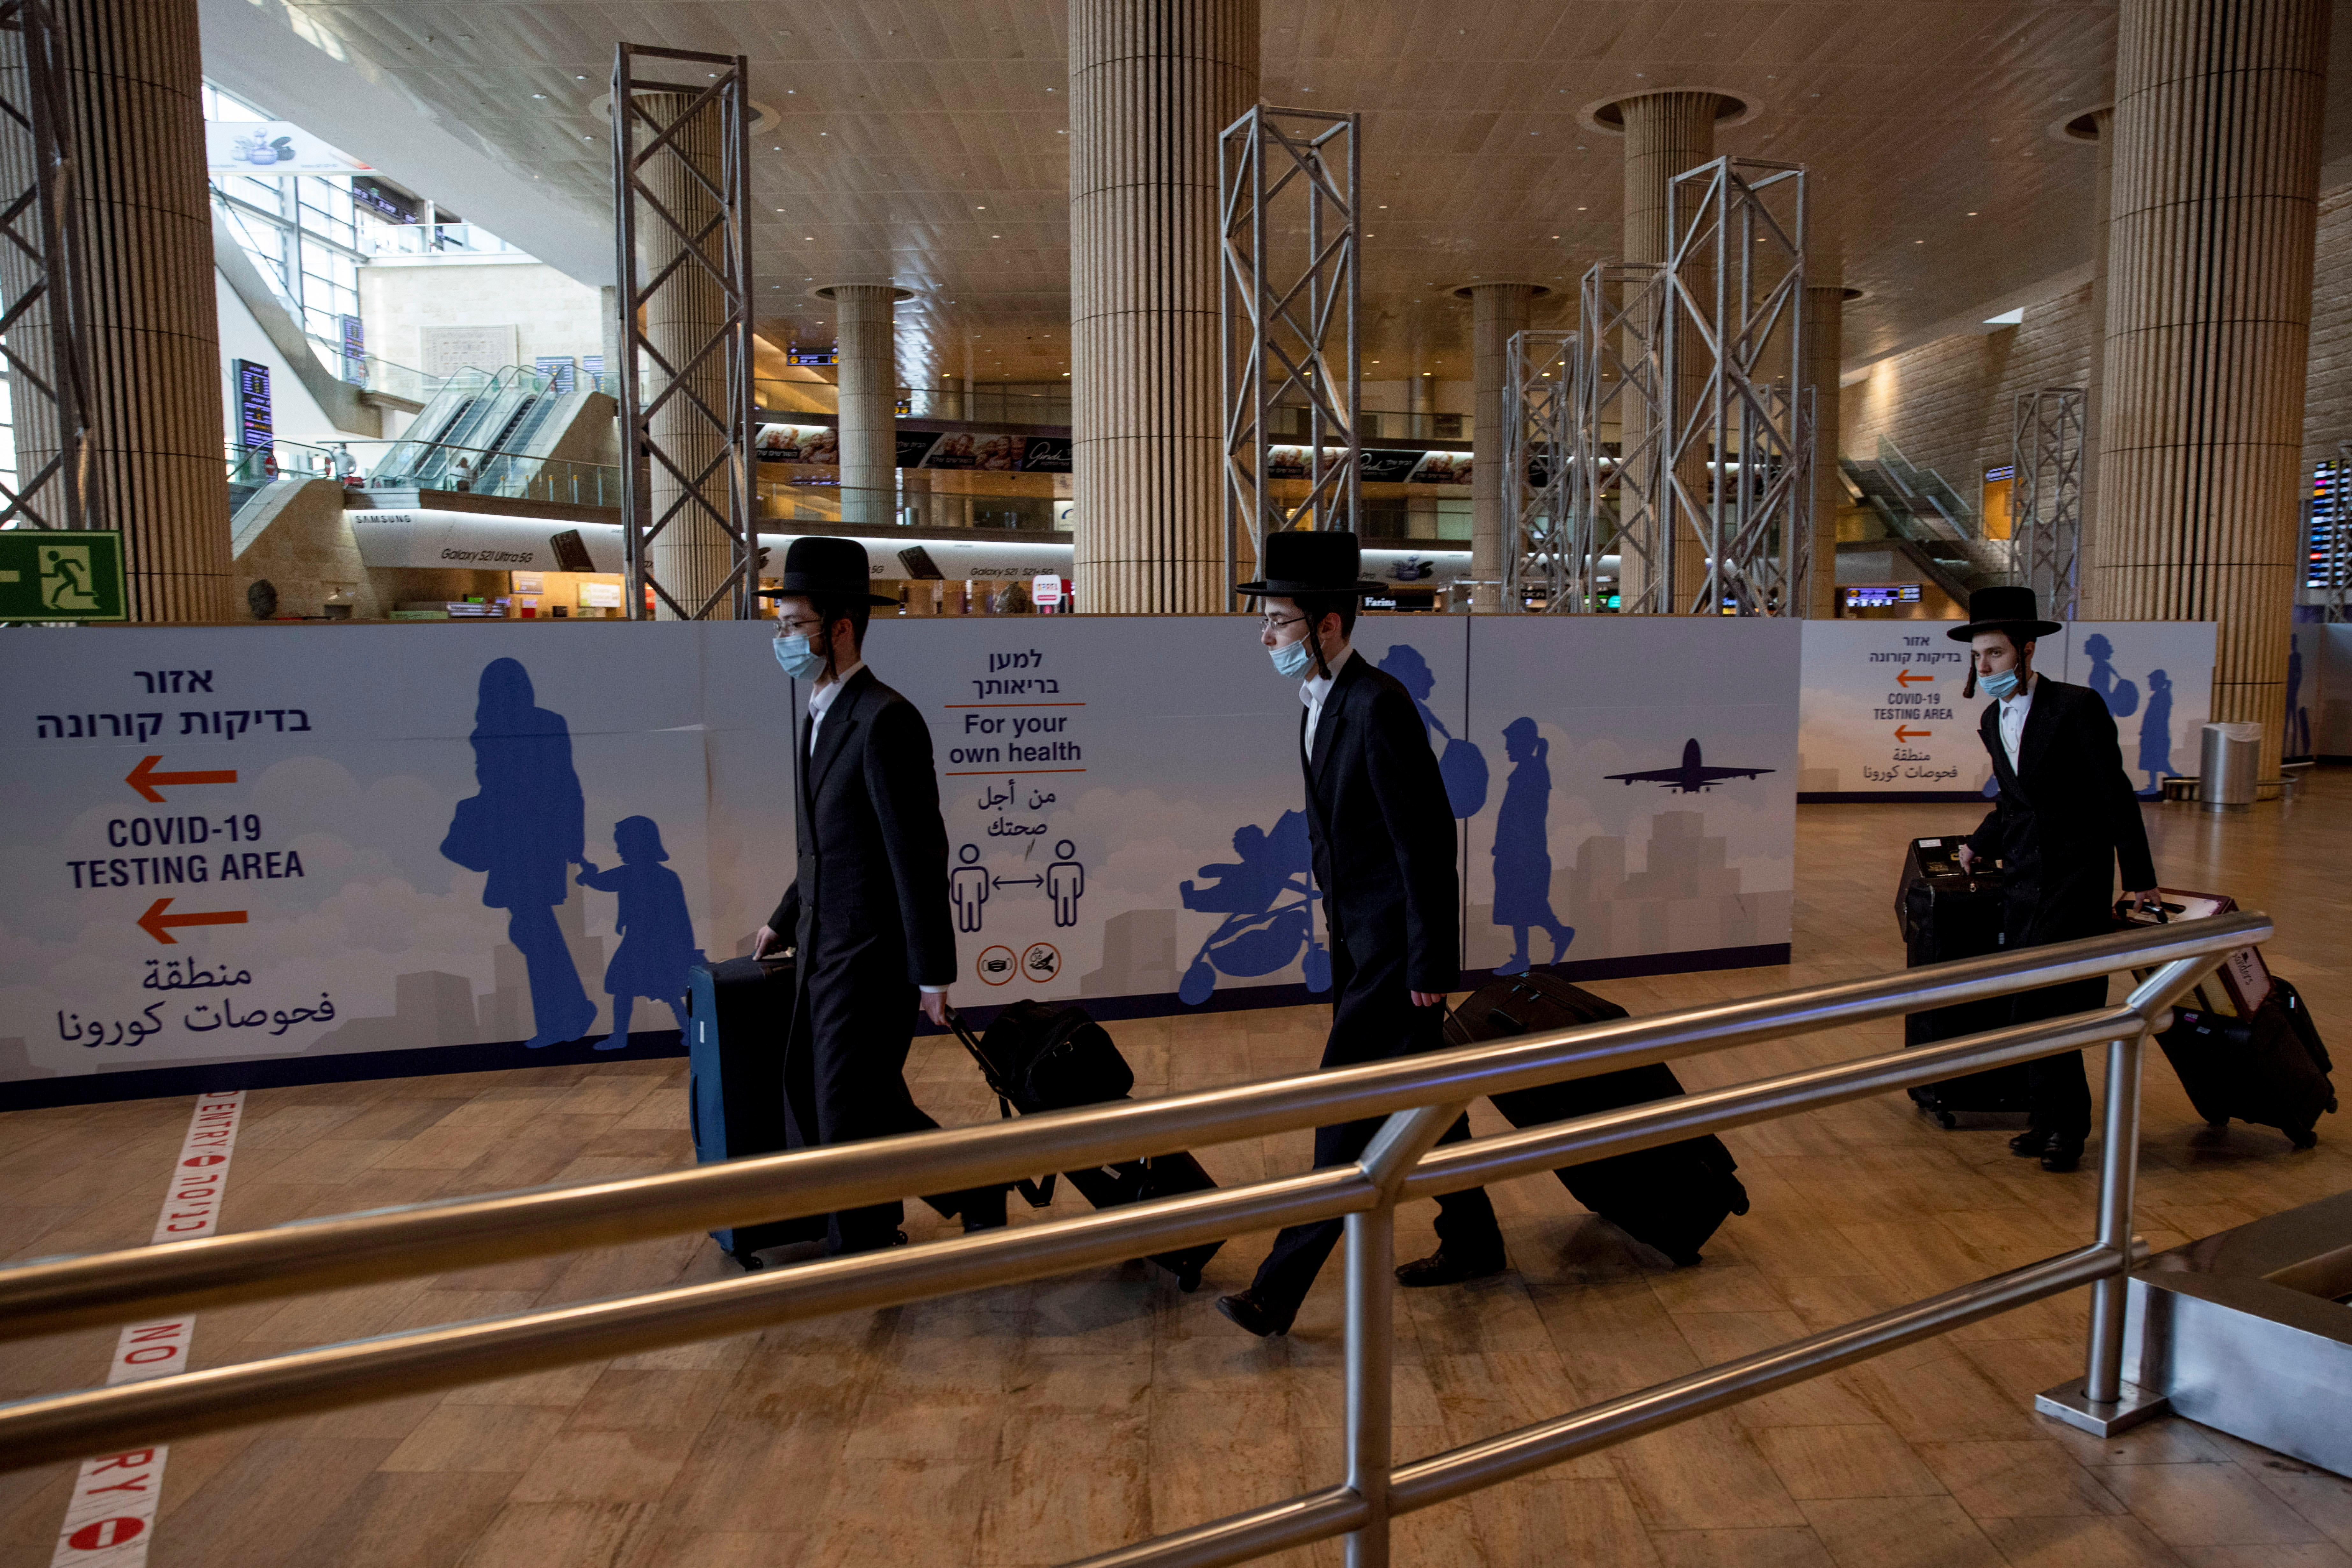 Ultra-Orthodox Jewish men walk after returning from overseas, at Ben Gurion International Airport in Lod, near Tel Aviv, Israel April 13, 2021. REUTERS/Ronen Zvulun